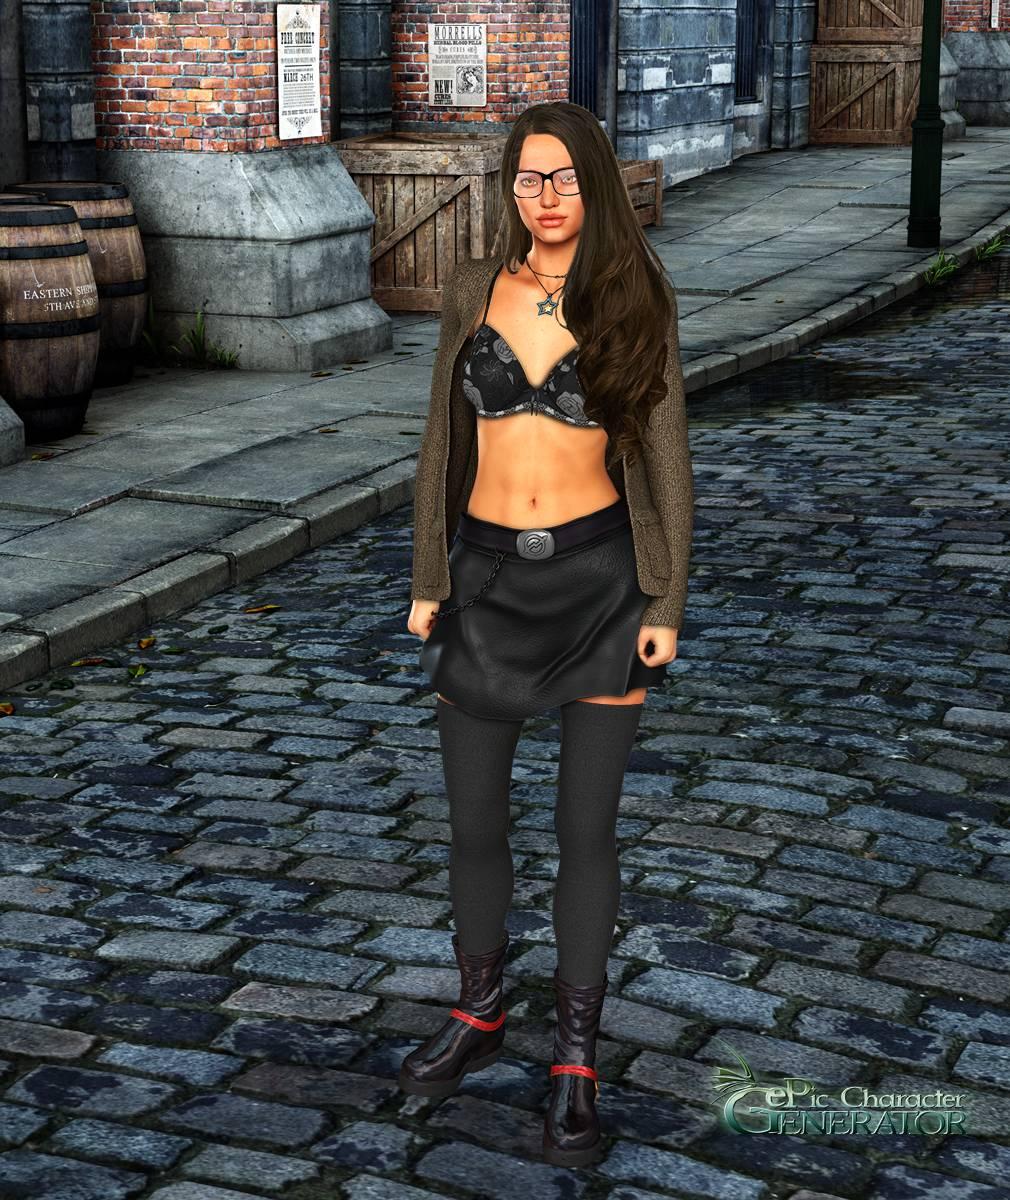 ePic Character Generator Season 2 Female Modern Screenshot 06